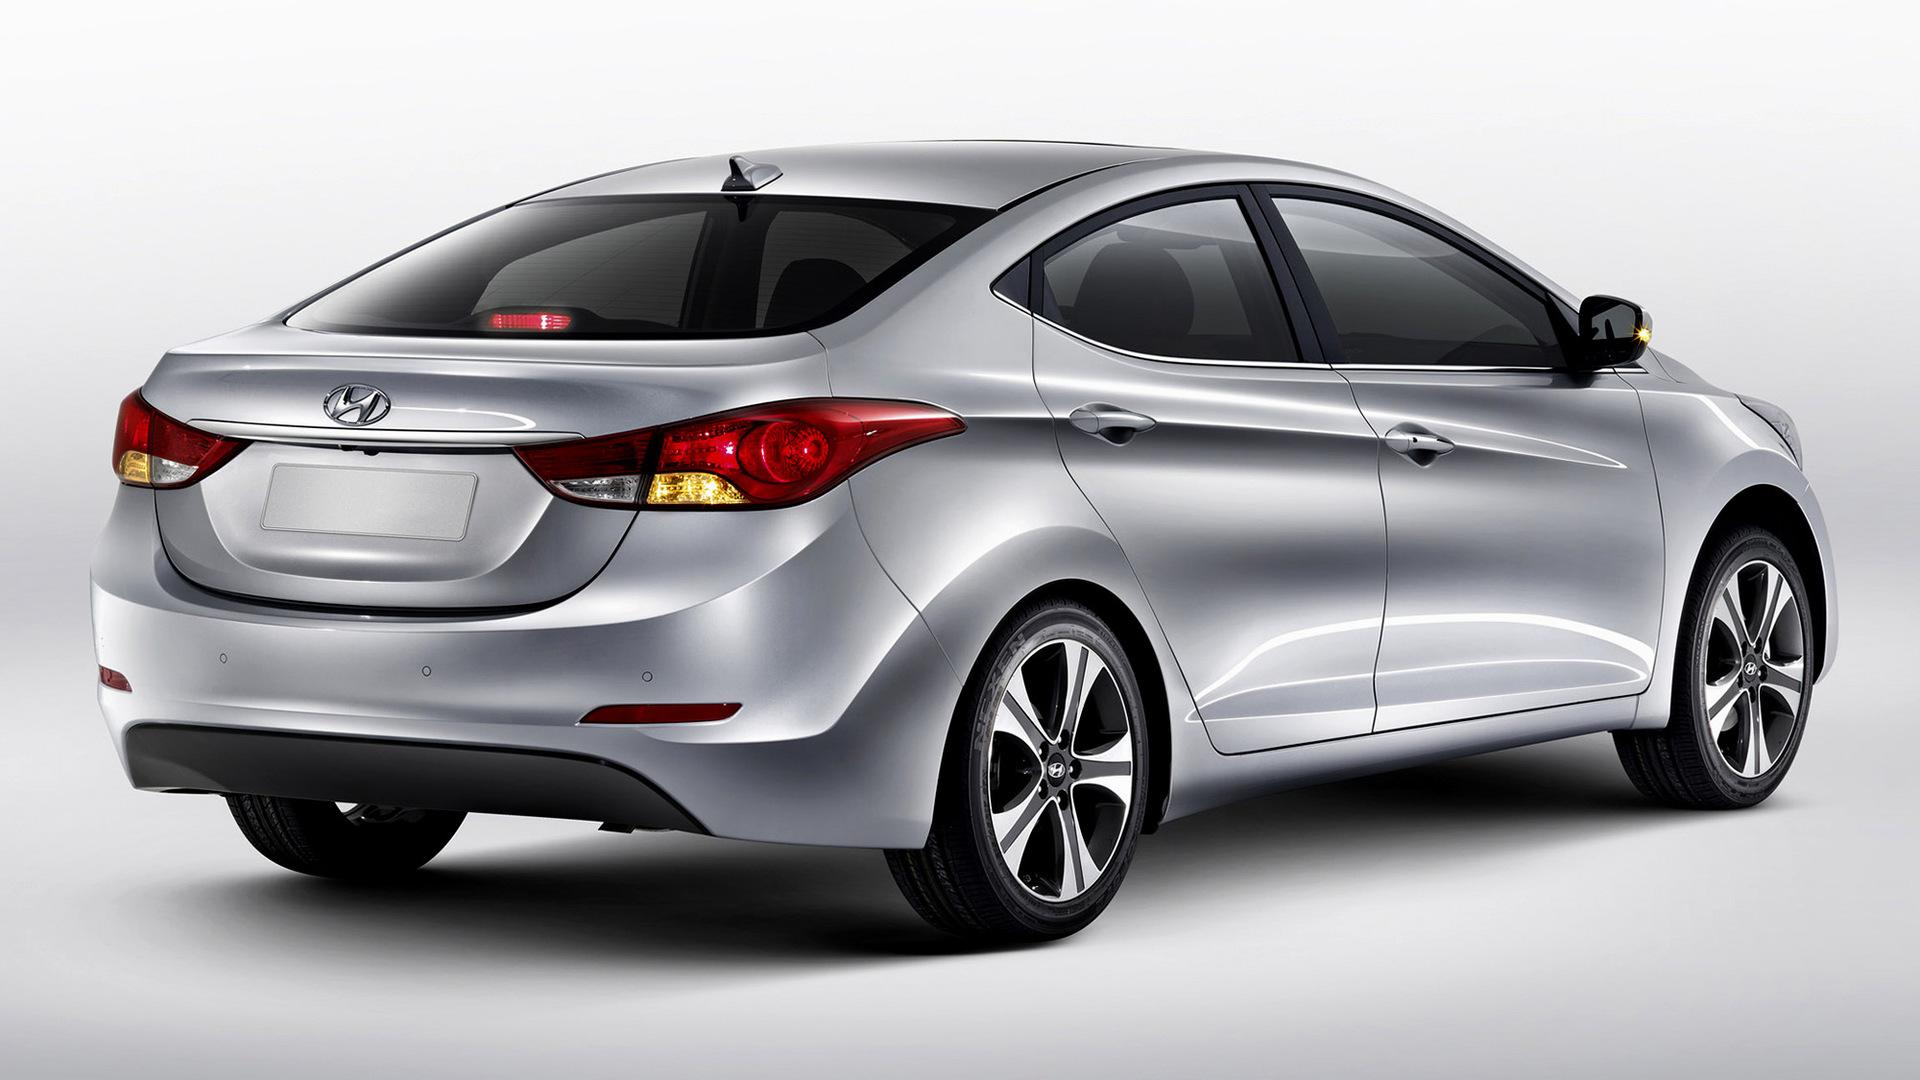 Hyundai Elantra Langdong Wallpaper Hd on 2018 Hyundai Elantra